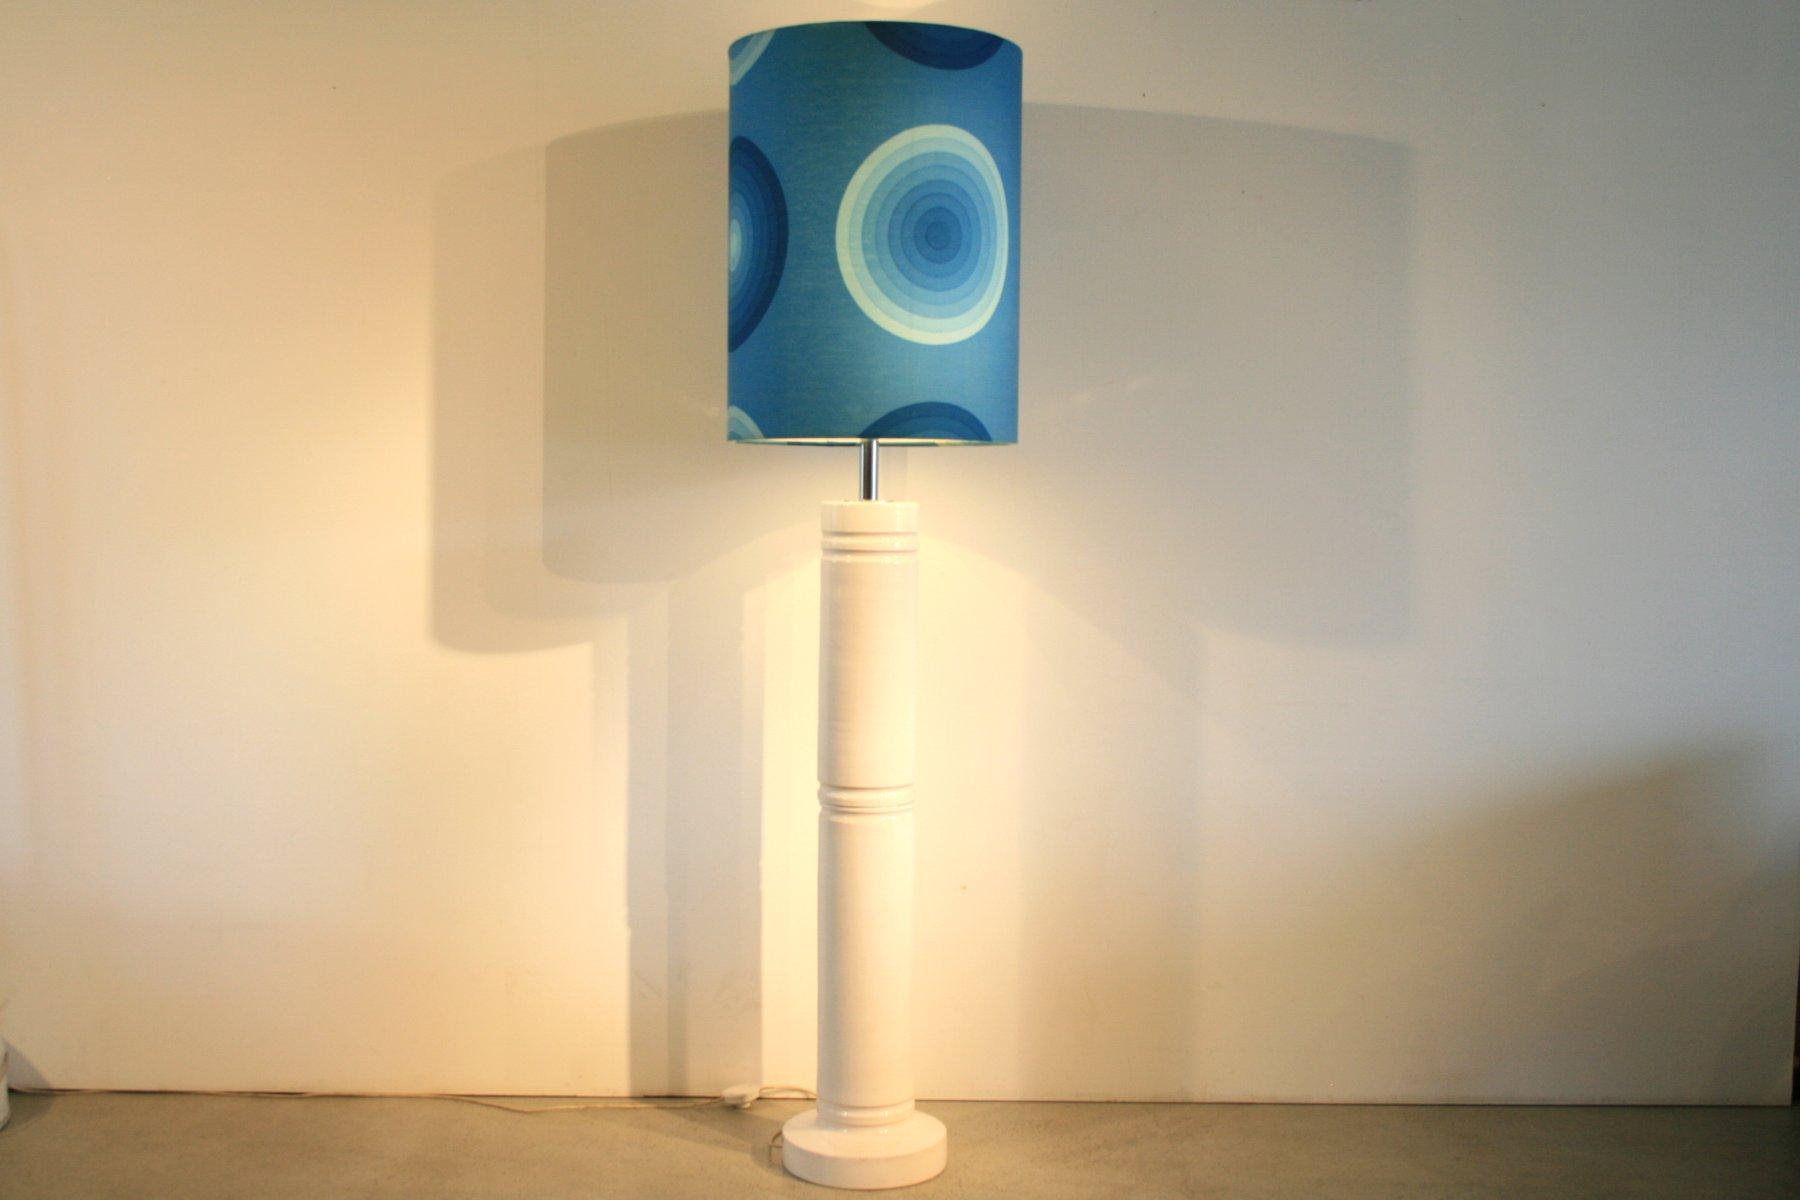 Stehlampe von Alma Rossini & Verner Panton, 1970er